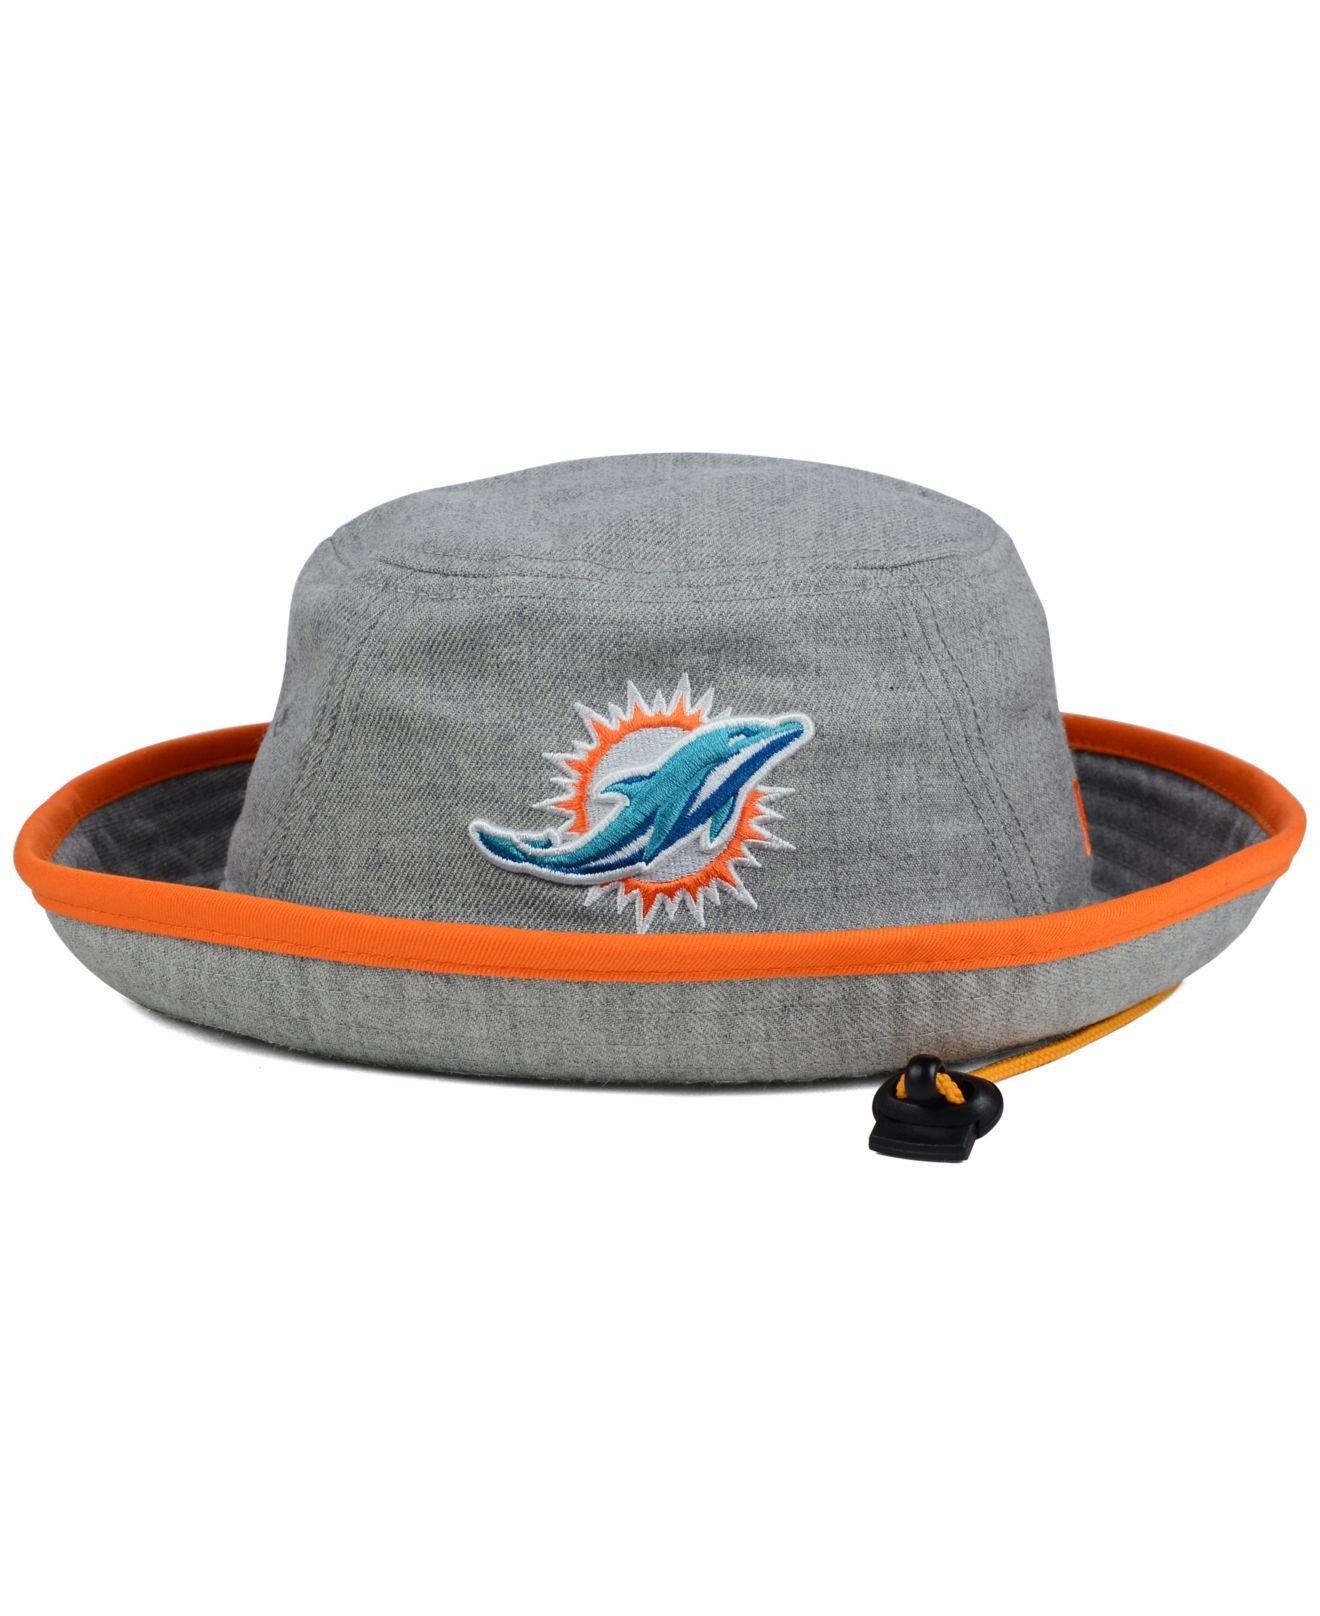 a71601491b0 ... sweden lyst ktz miami dolphins nfl heather gray bucket hat in gray  ecdd5 041be